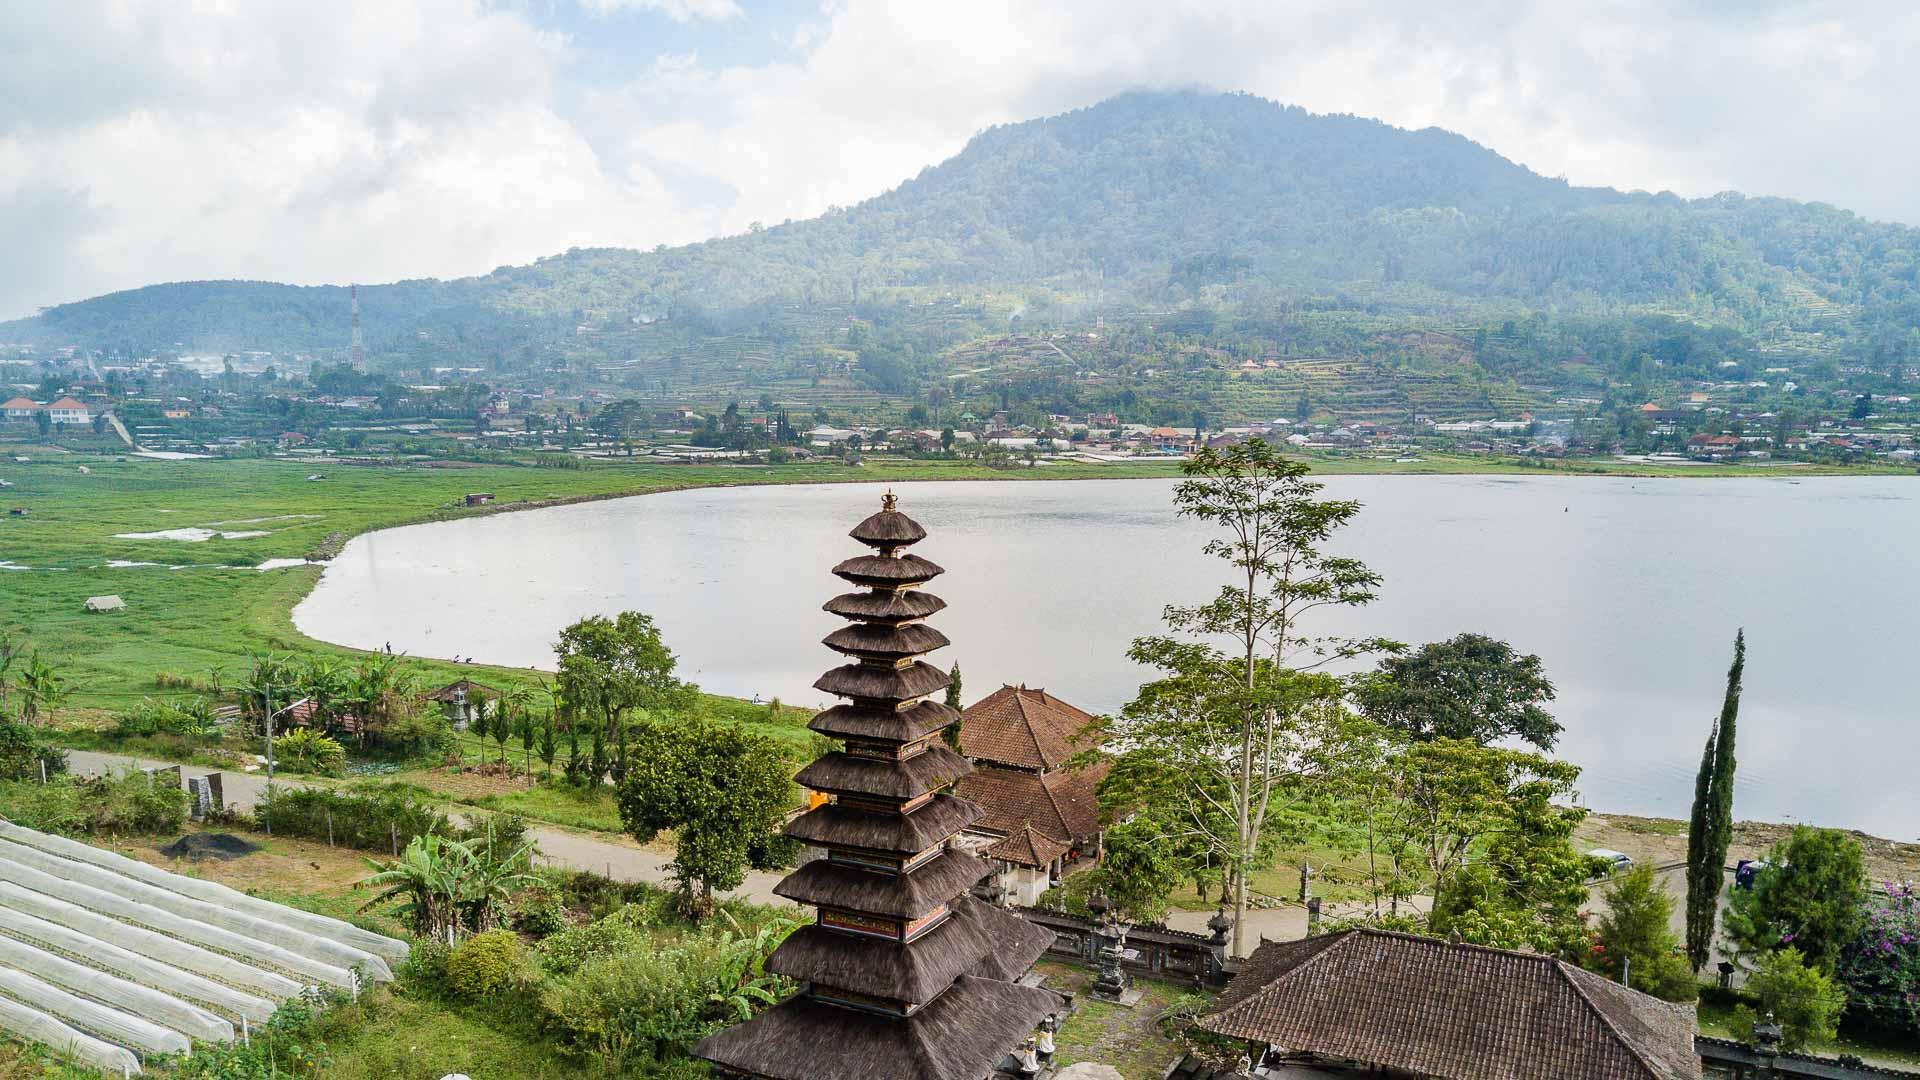 Pura Ulun Danu Buyan near Lake Buyan